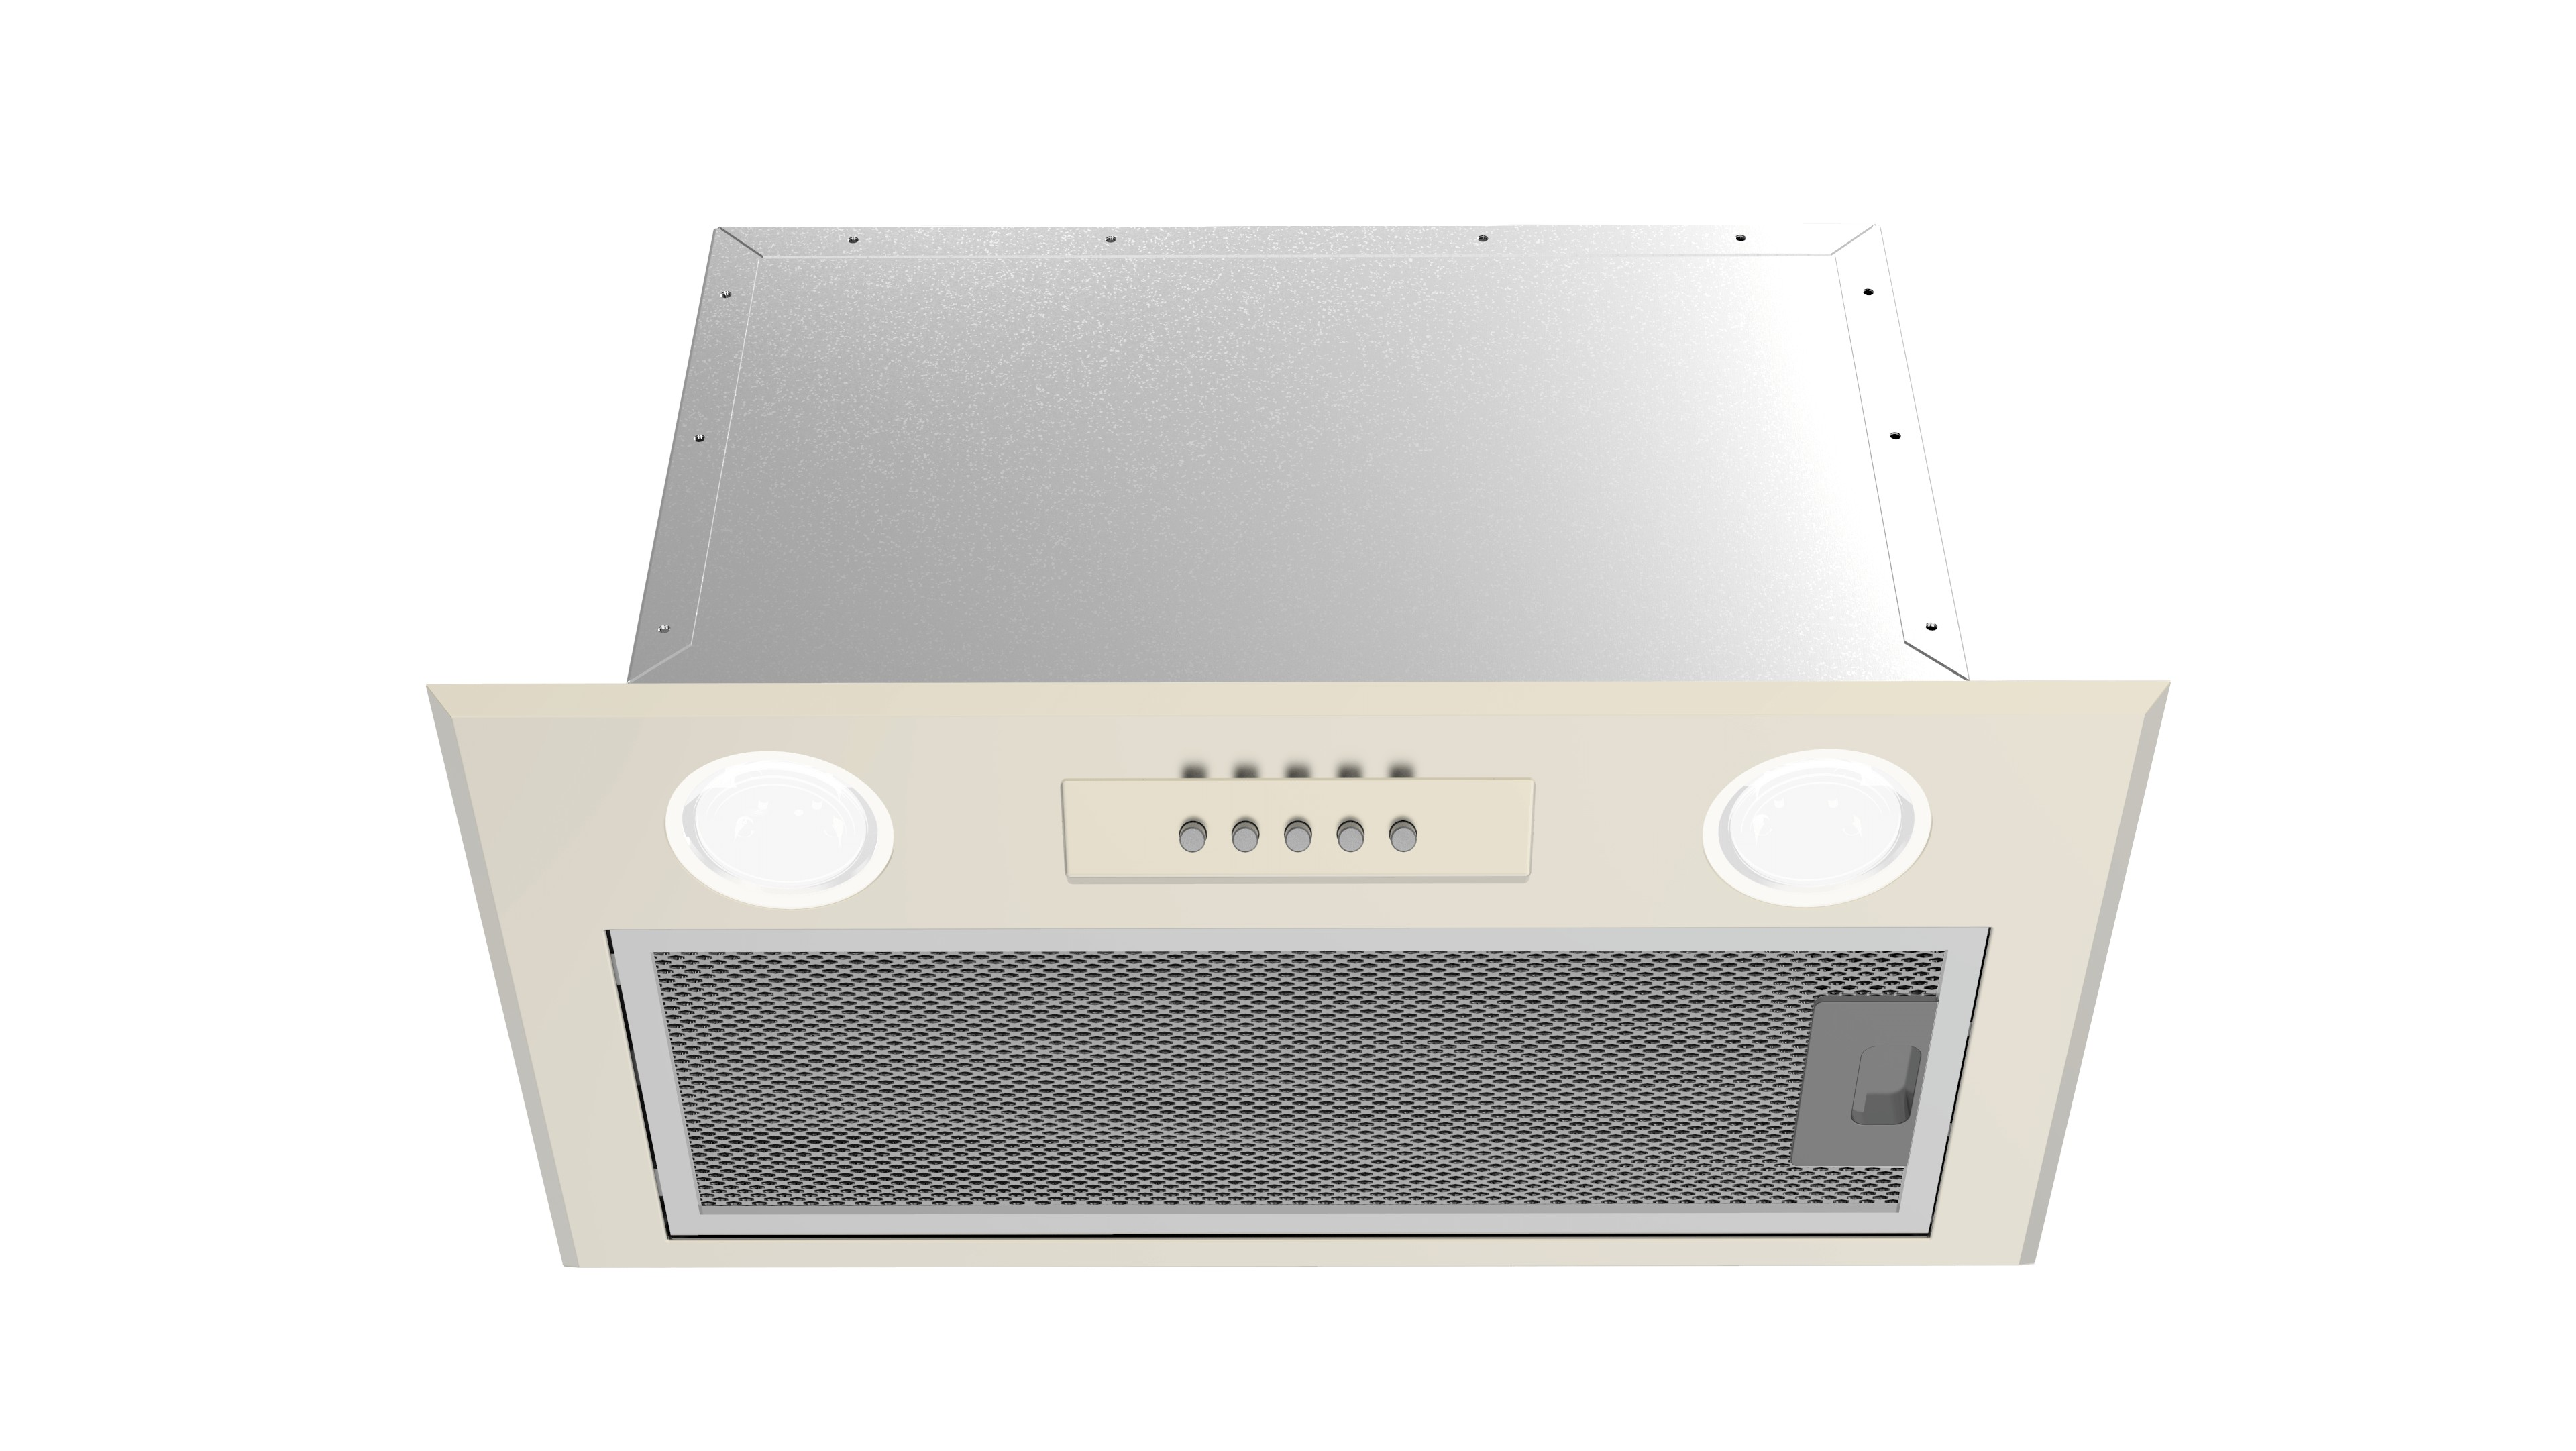 Вытяжка кухонная Midea MH60I350I